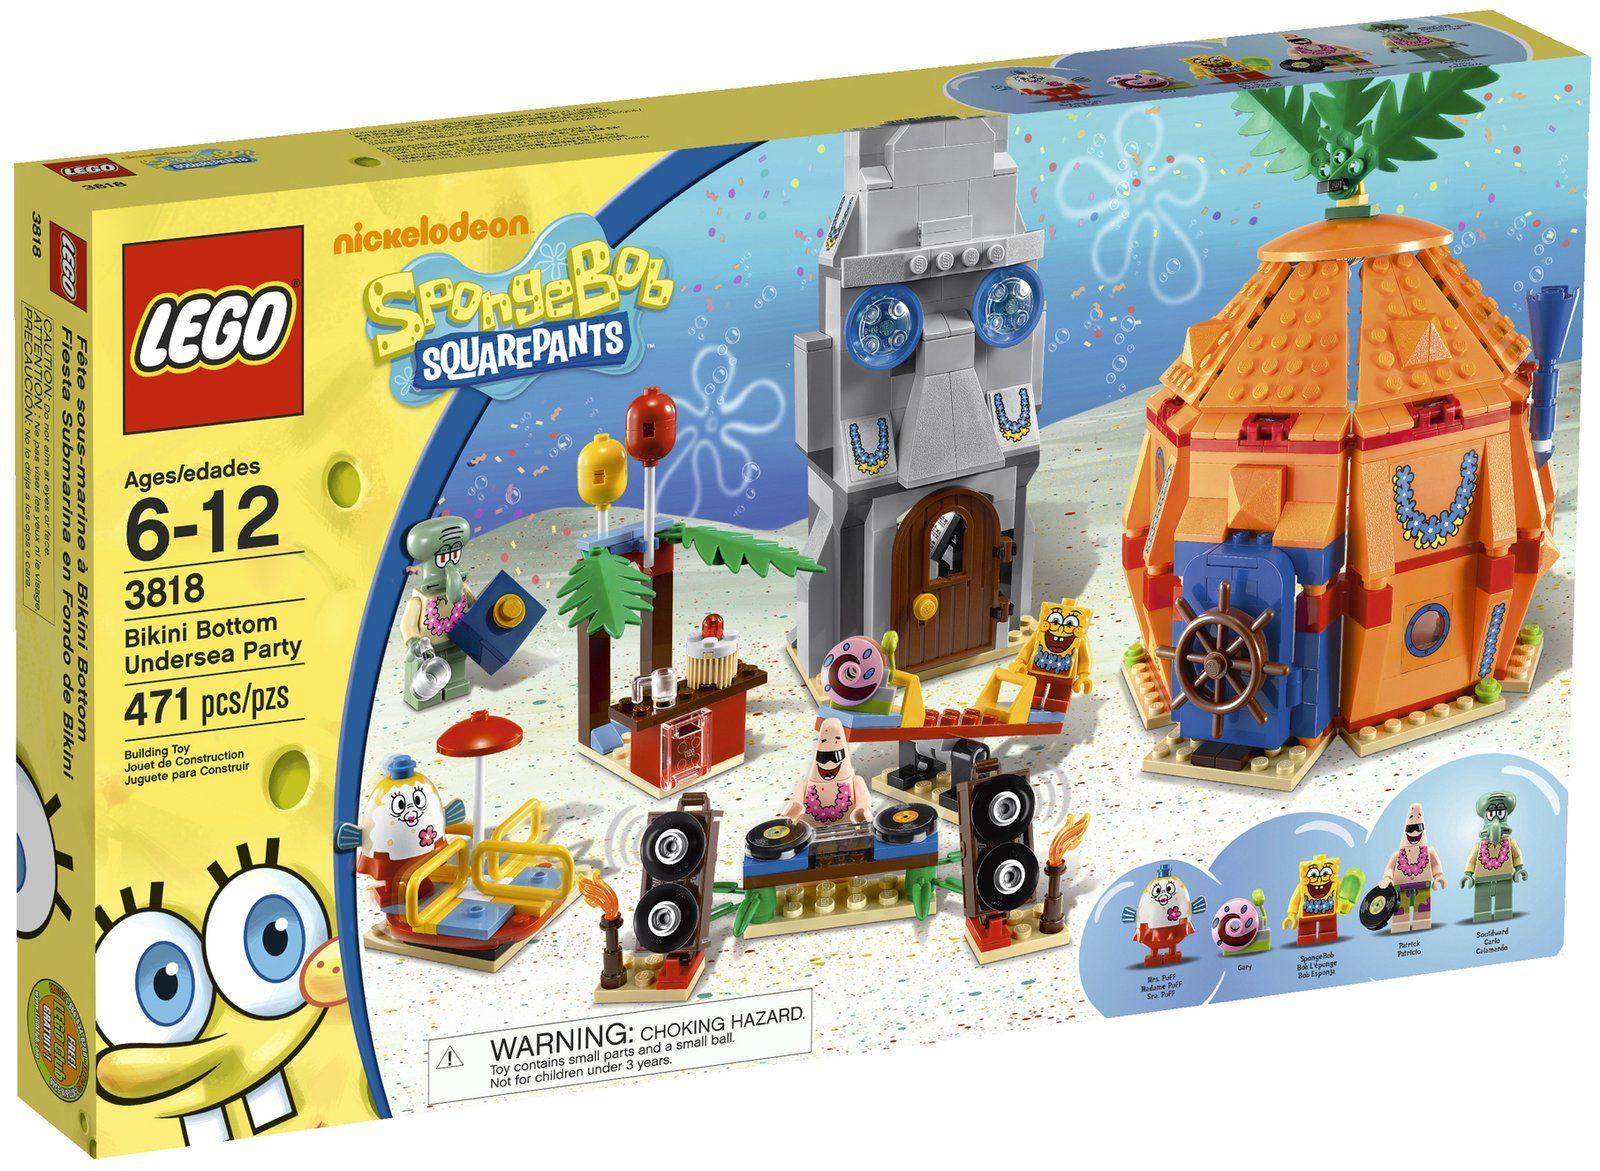 Spongebob Bedroom Furniture Spongebob Squarepants Bedroom Play Set By Play Along 5999